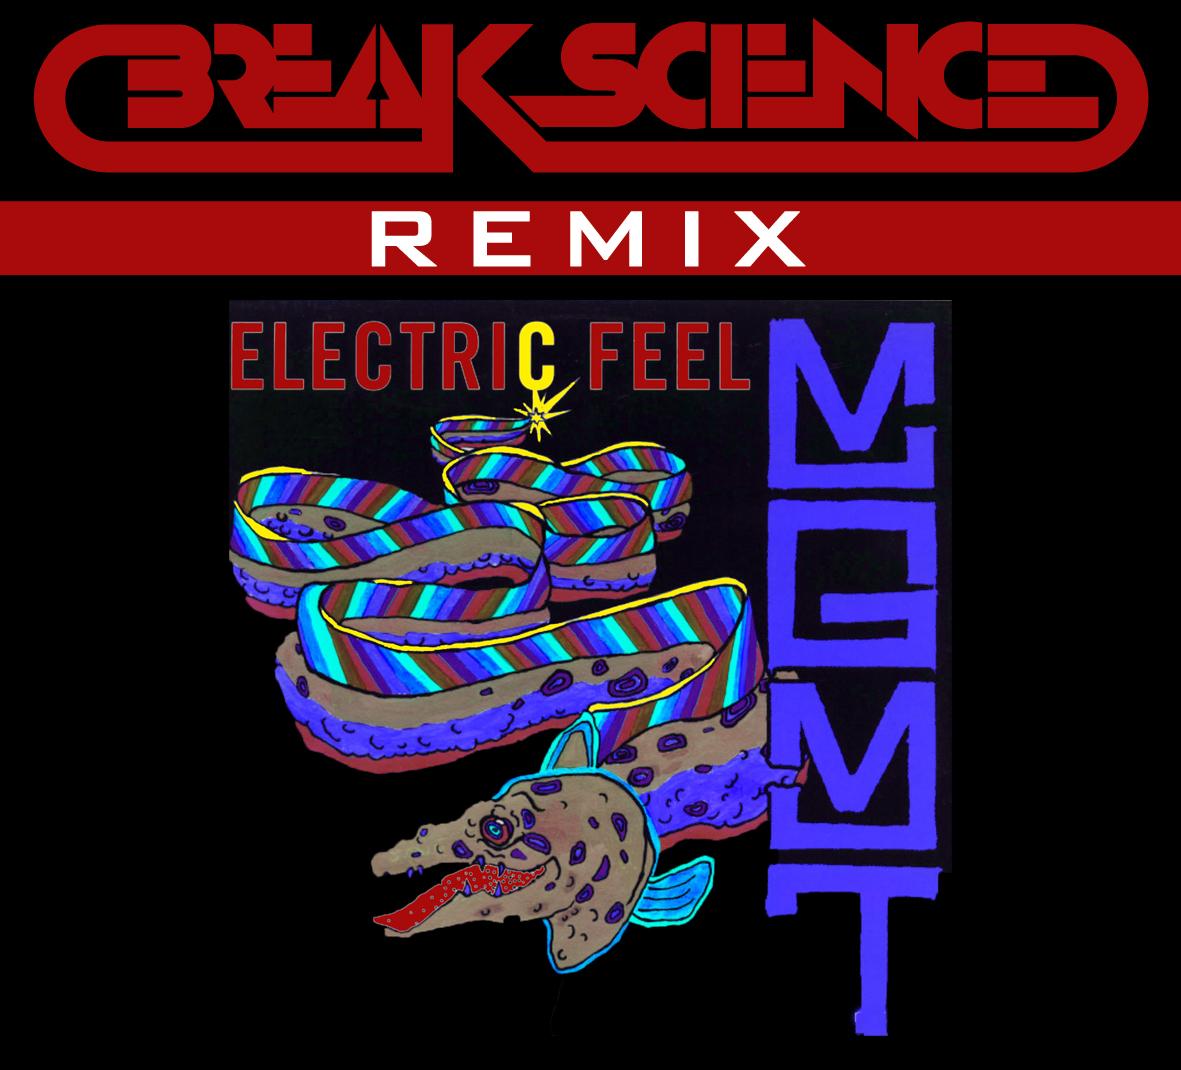 Electric-Feel.jpg